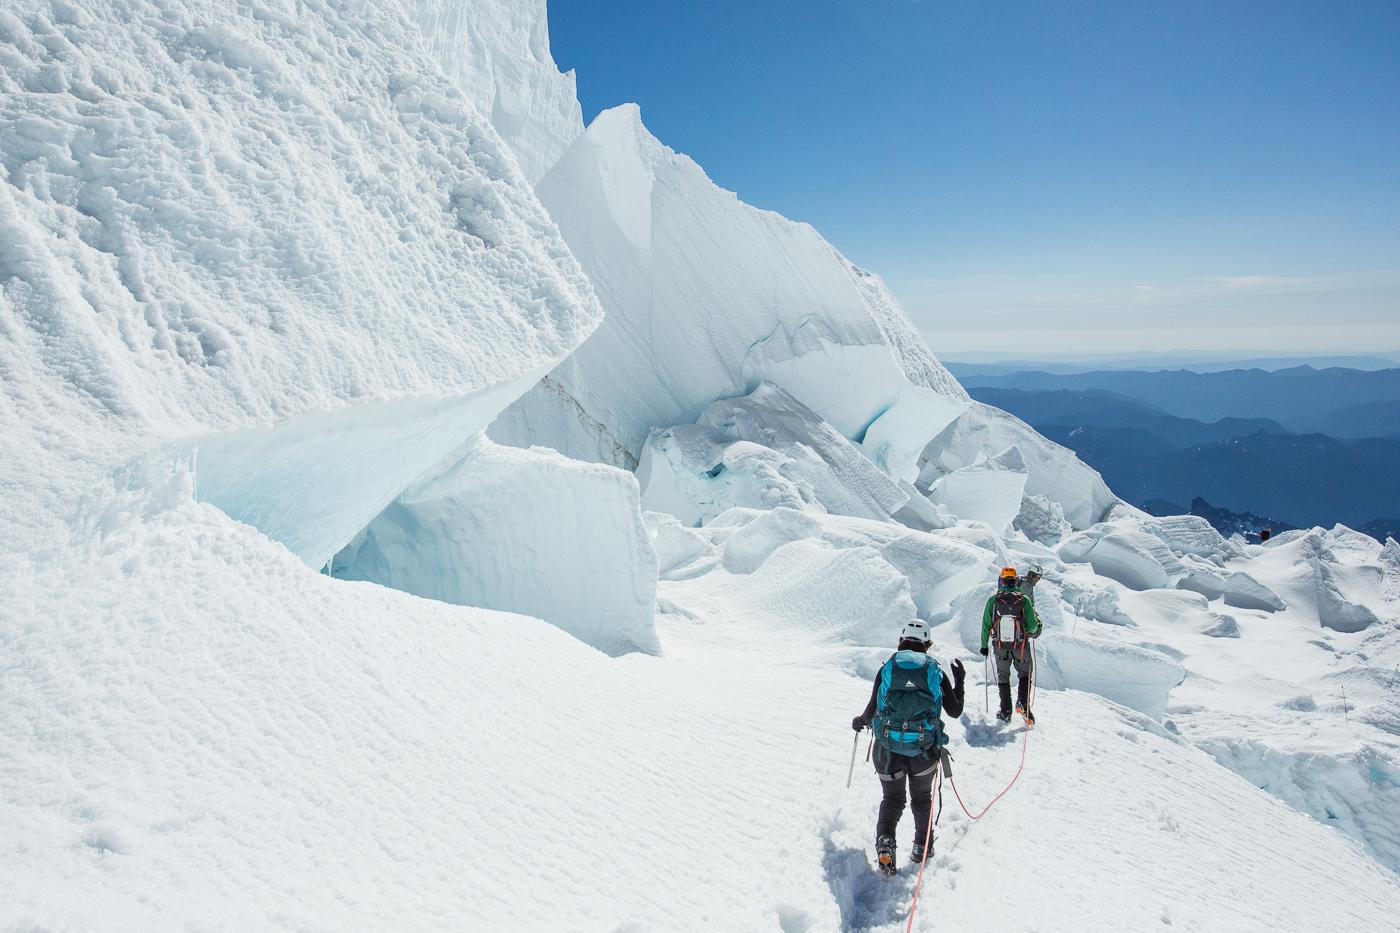 Crossing the Glaciers